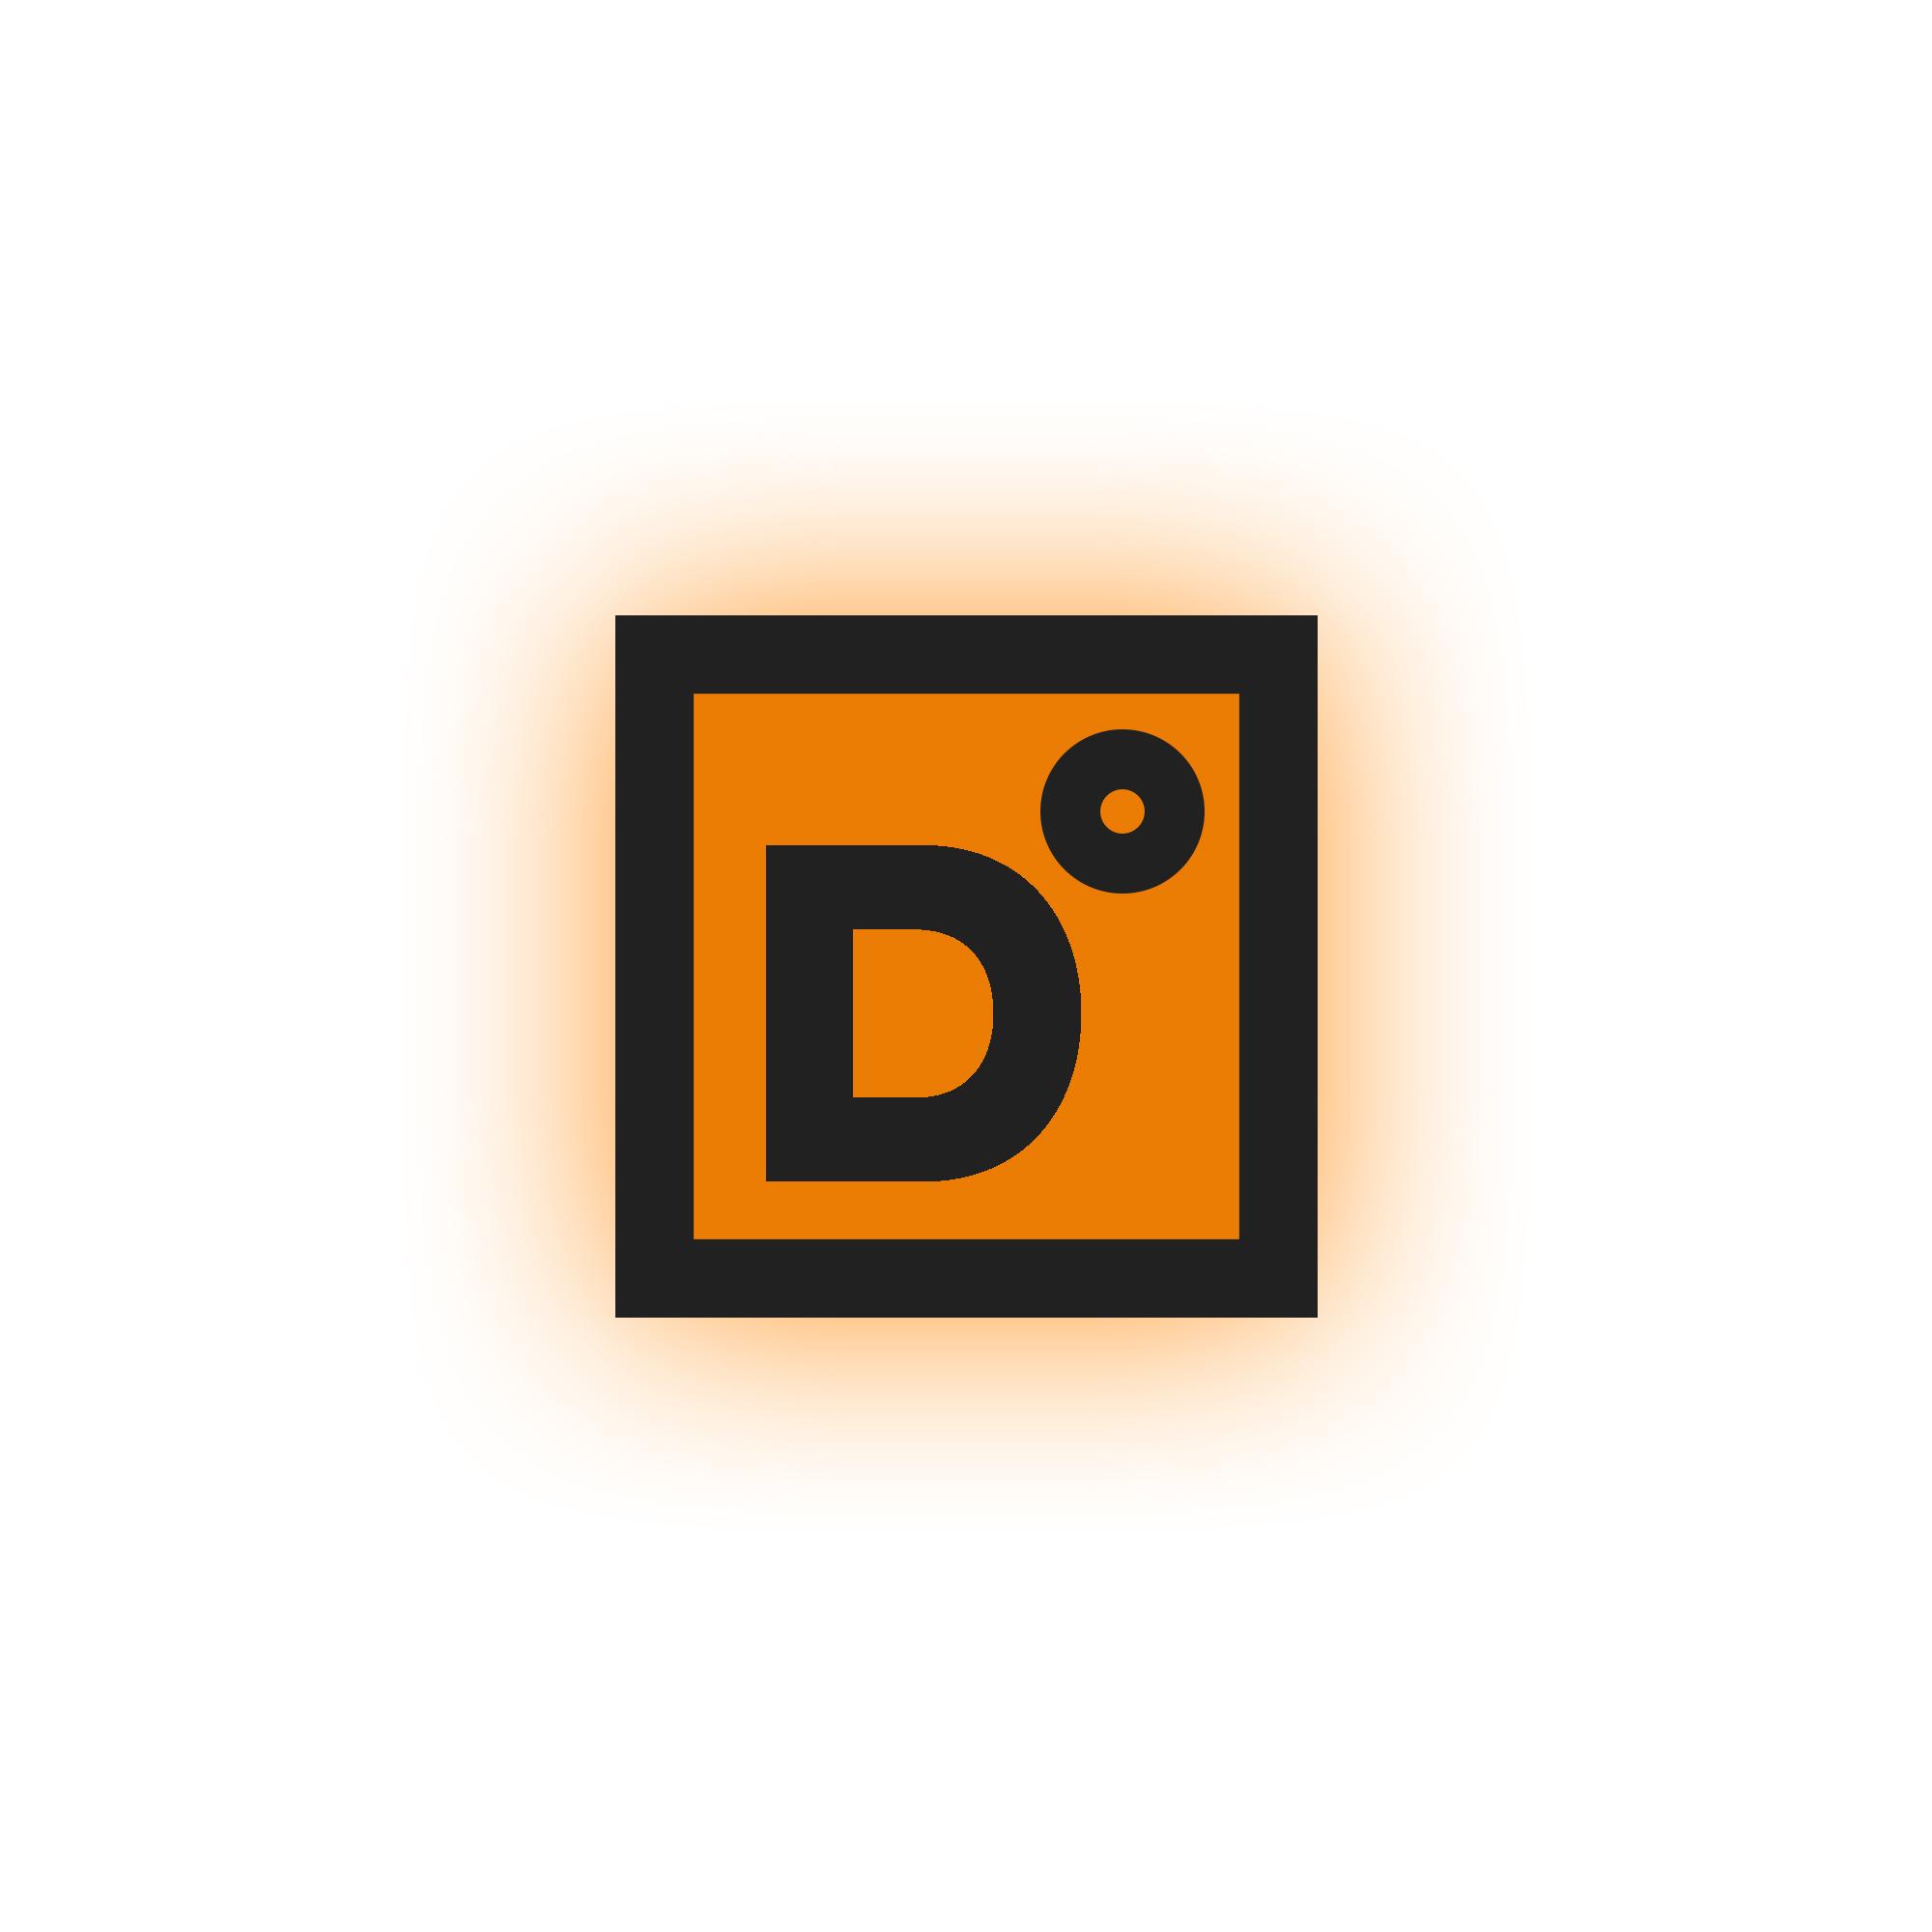 Конкурс на разработку логотипа для компании Dantex Group  фото f_8125bfed5d3311b5.jpg